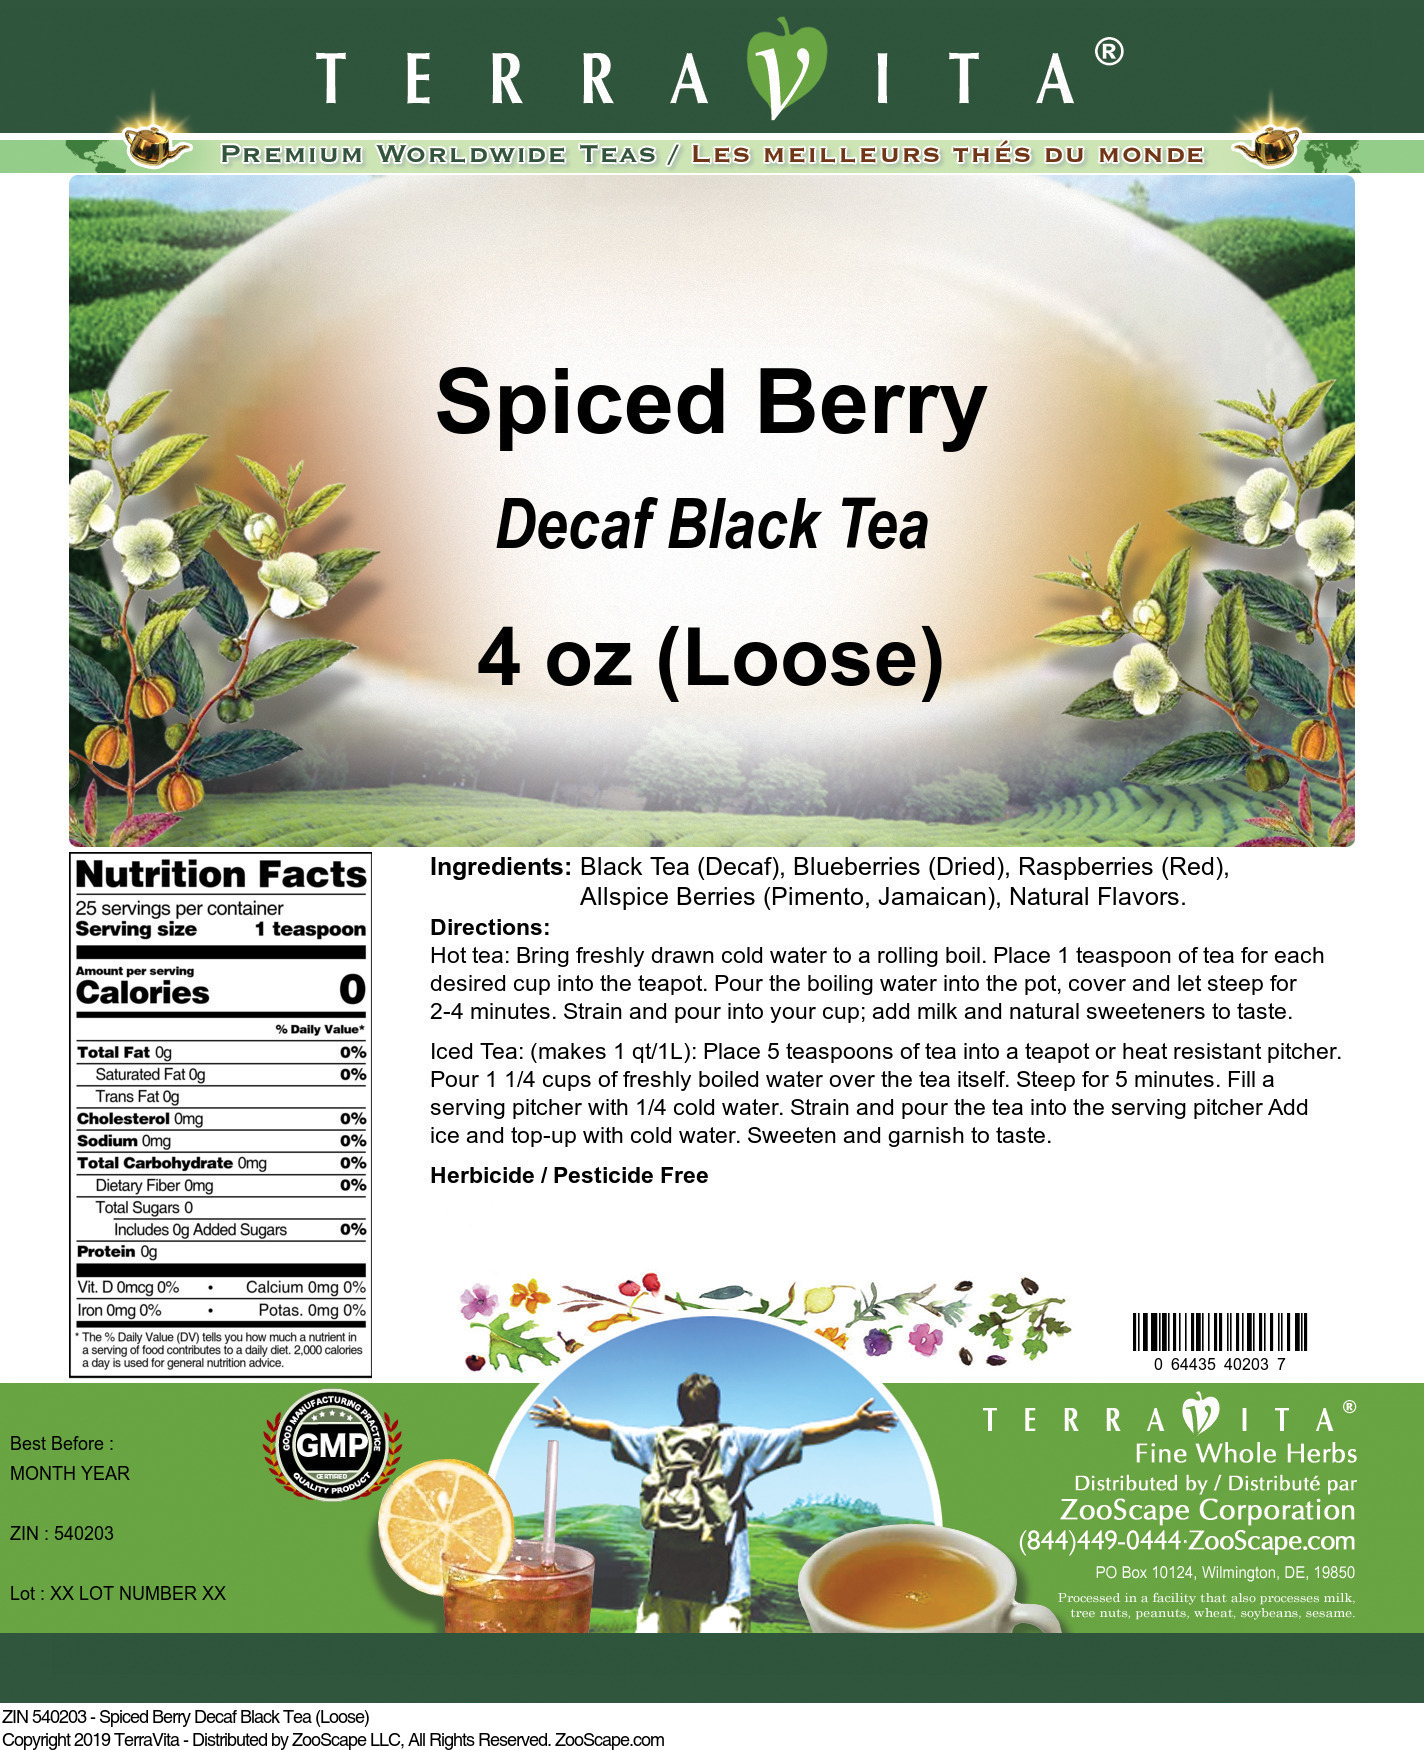 Spiced Berry Decaf Black Tea